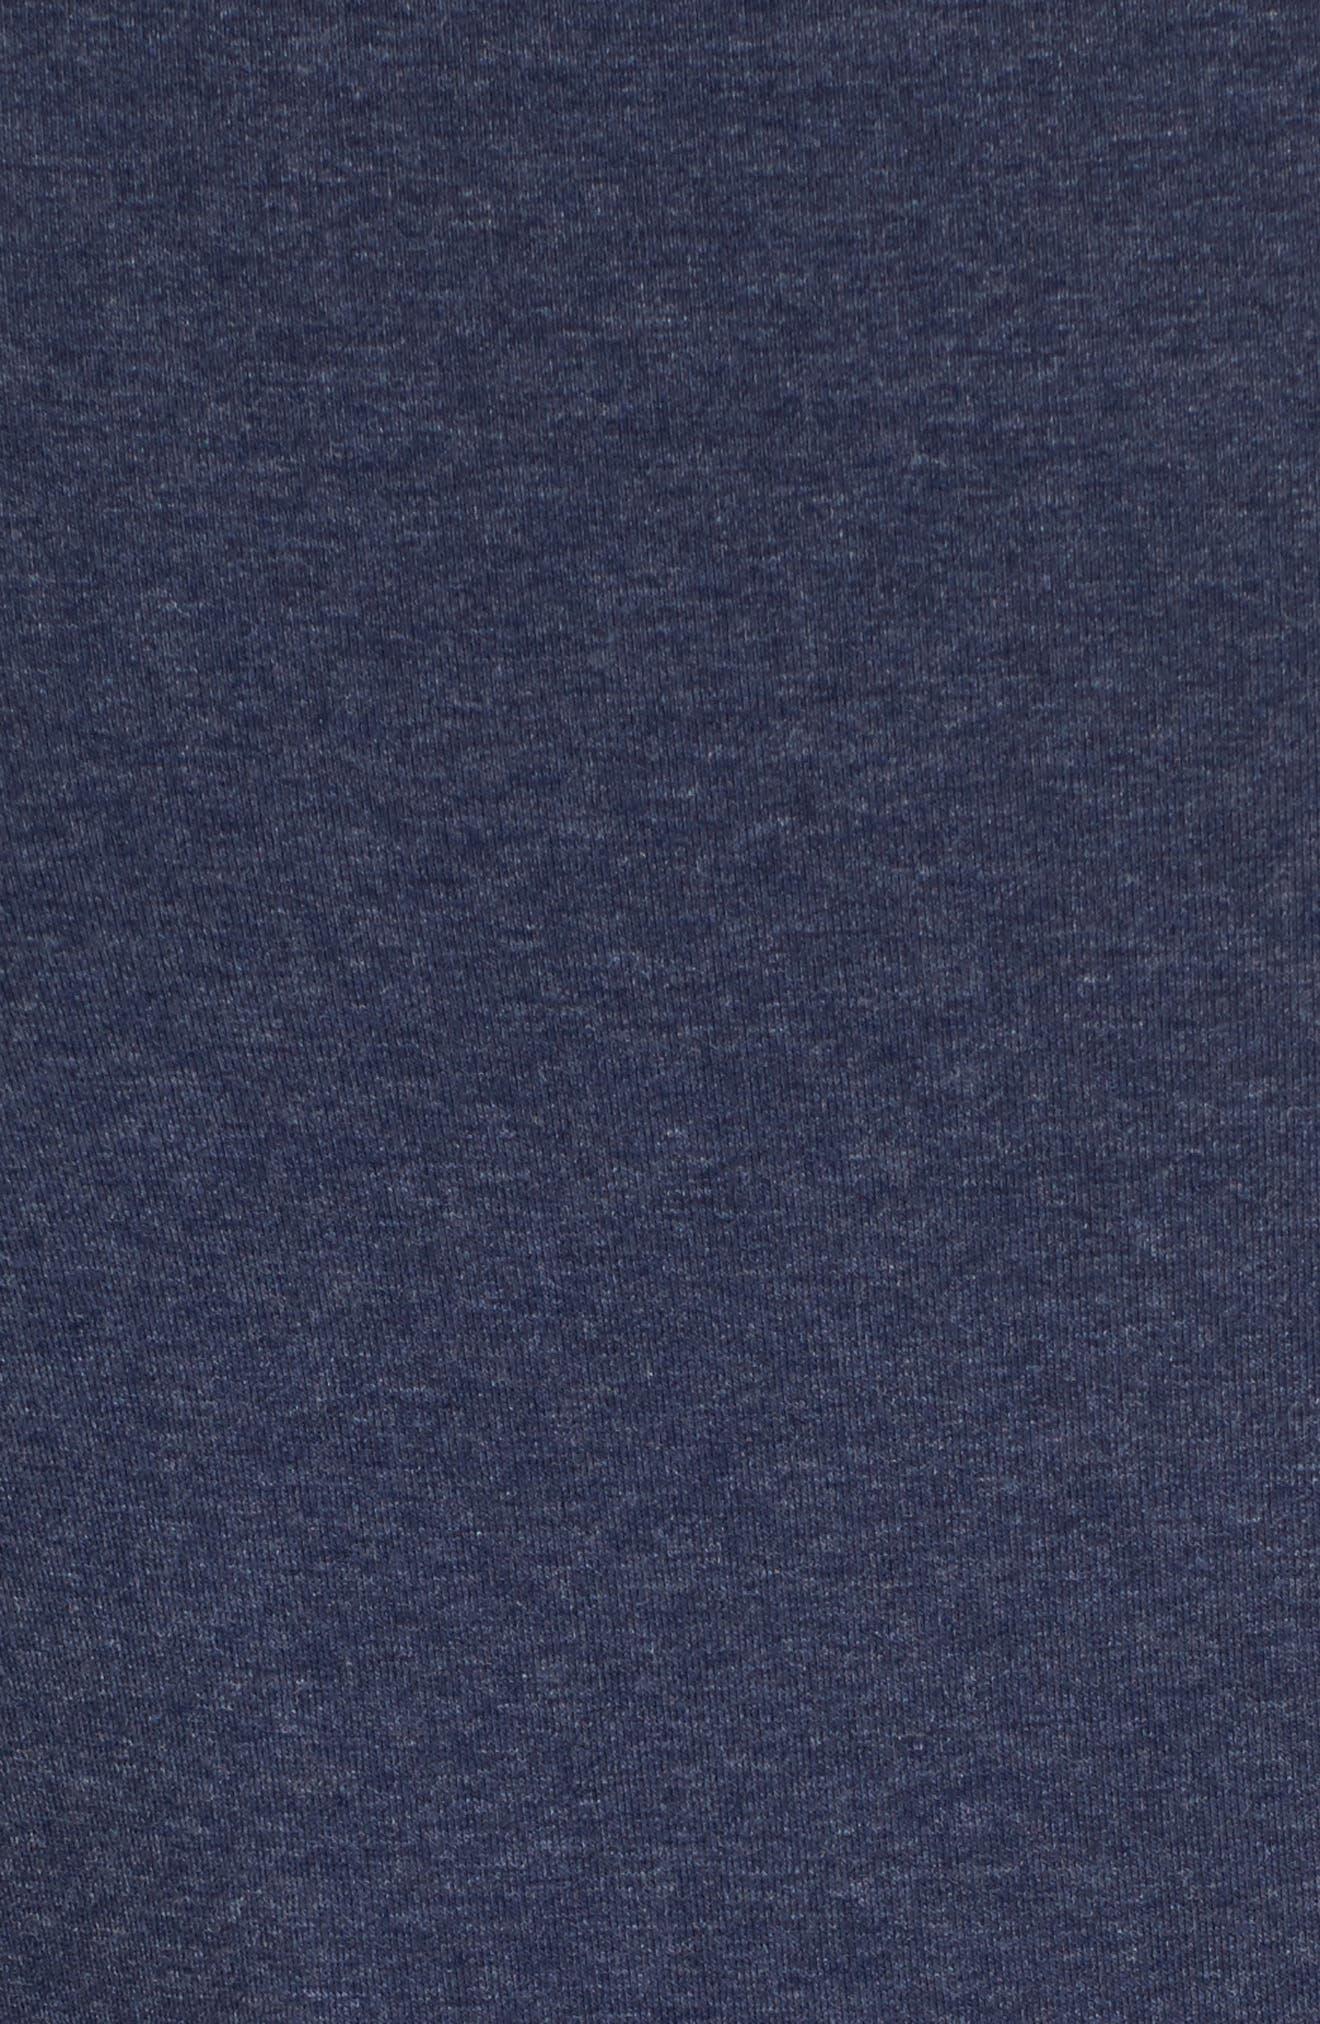 Long Sleeve Bateau Neck Tee,                             Alternate thumbnail 5, color,                             Navy Patriot Heather